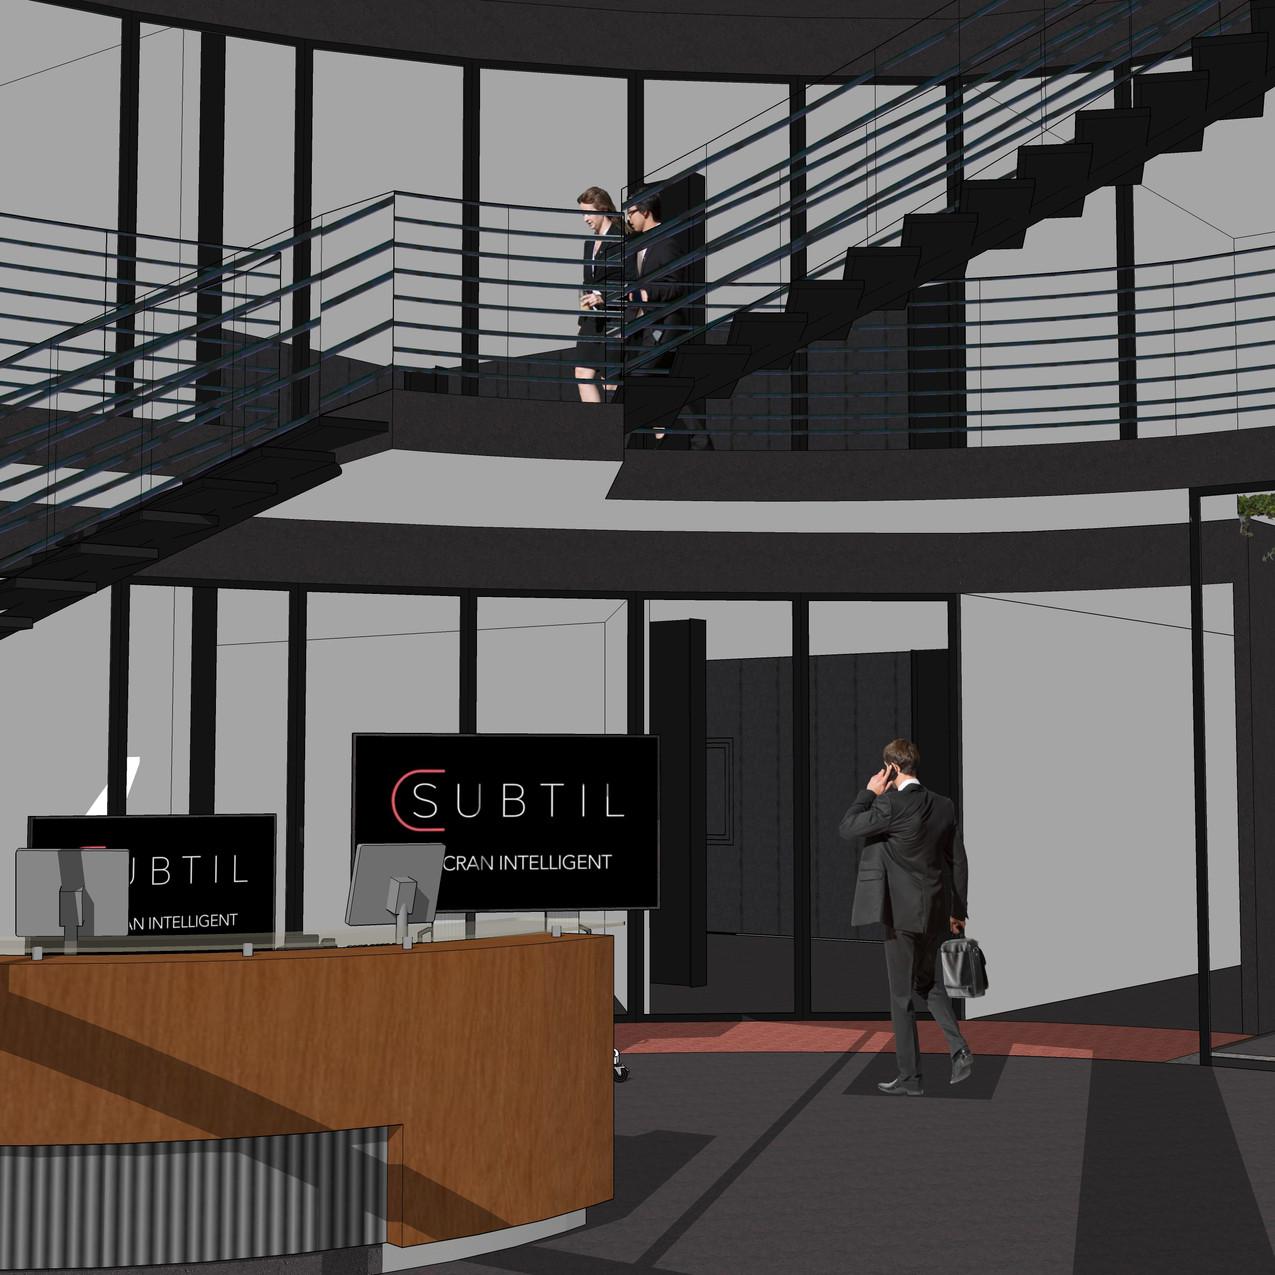 CSUBTIL - 23022018 - VUE ACCUEIL